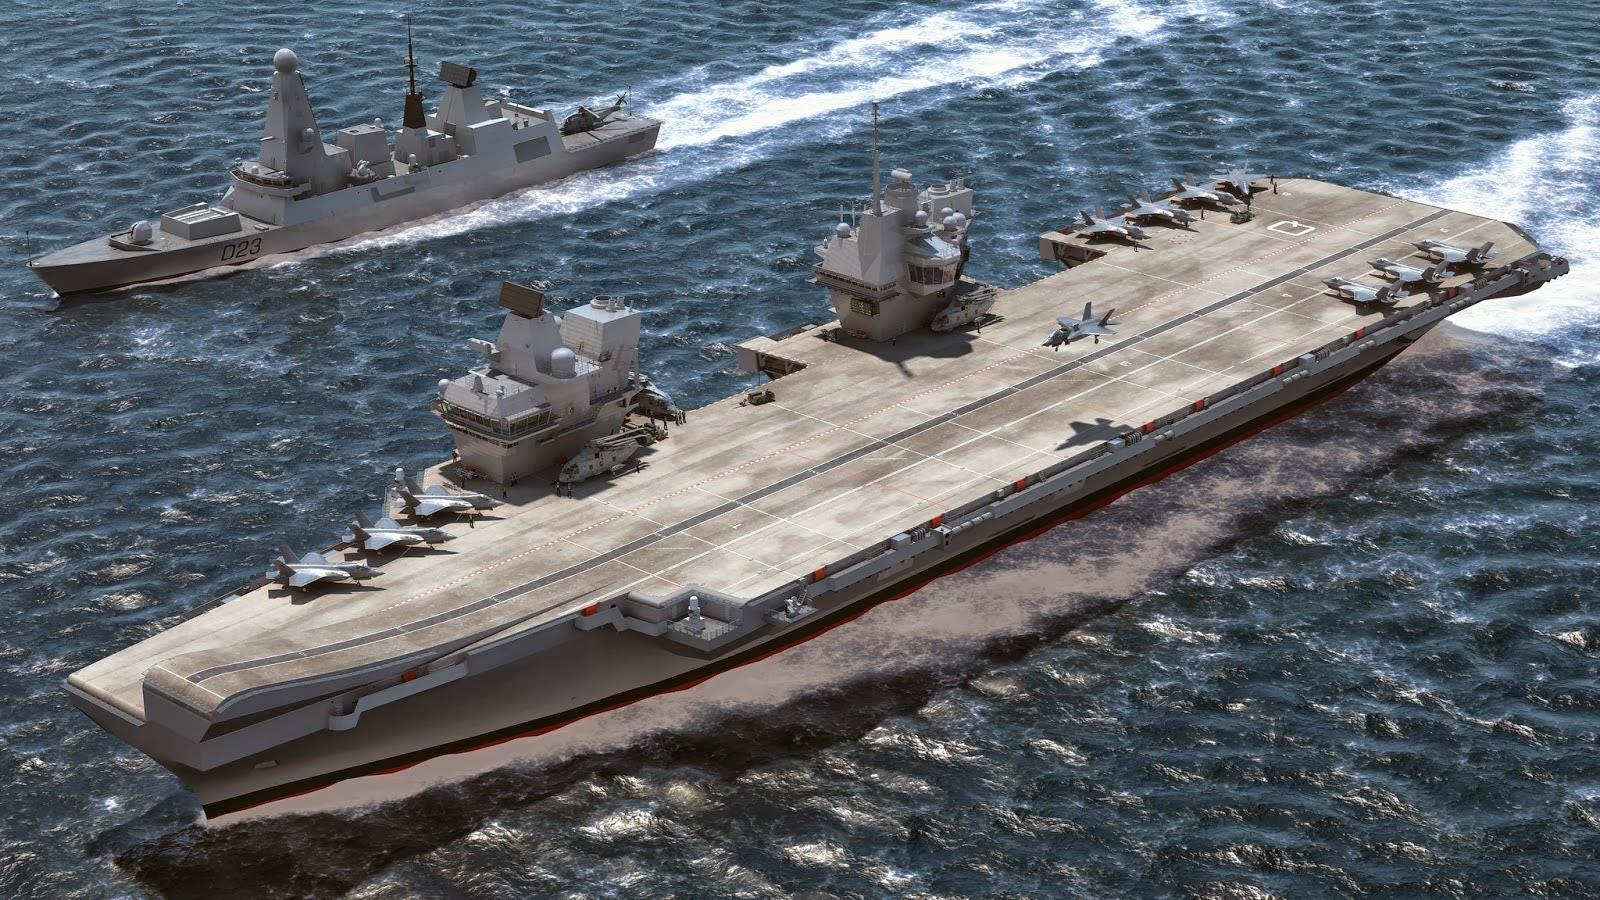 British Aircraft Carrier Queen Elizabeth My Continuing Educatio...